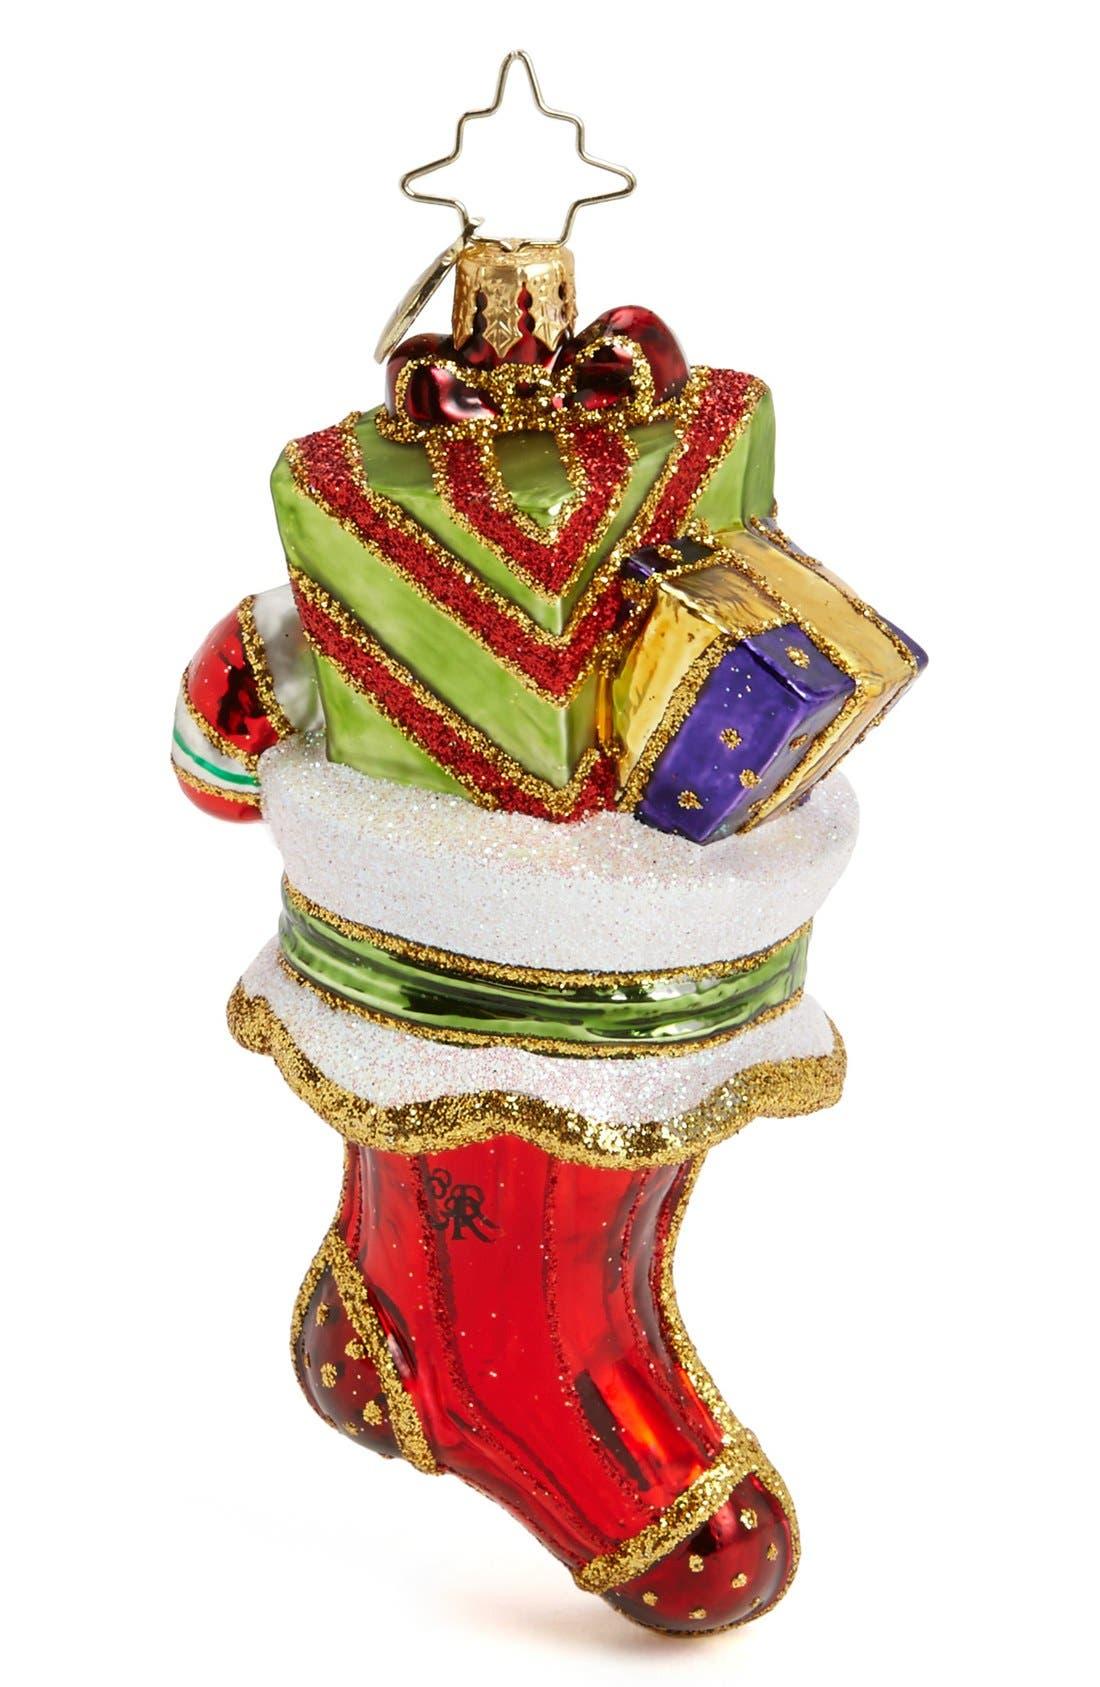 Main Image - Christopher Radko 'A Superb Stocking' Ornament